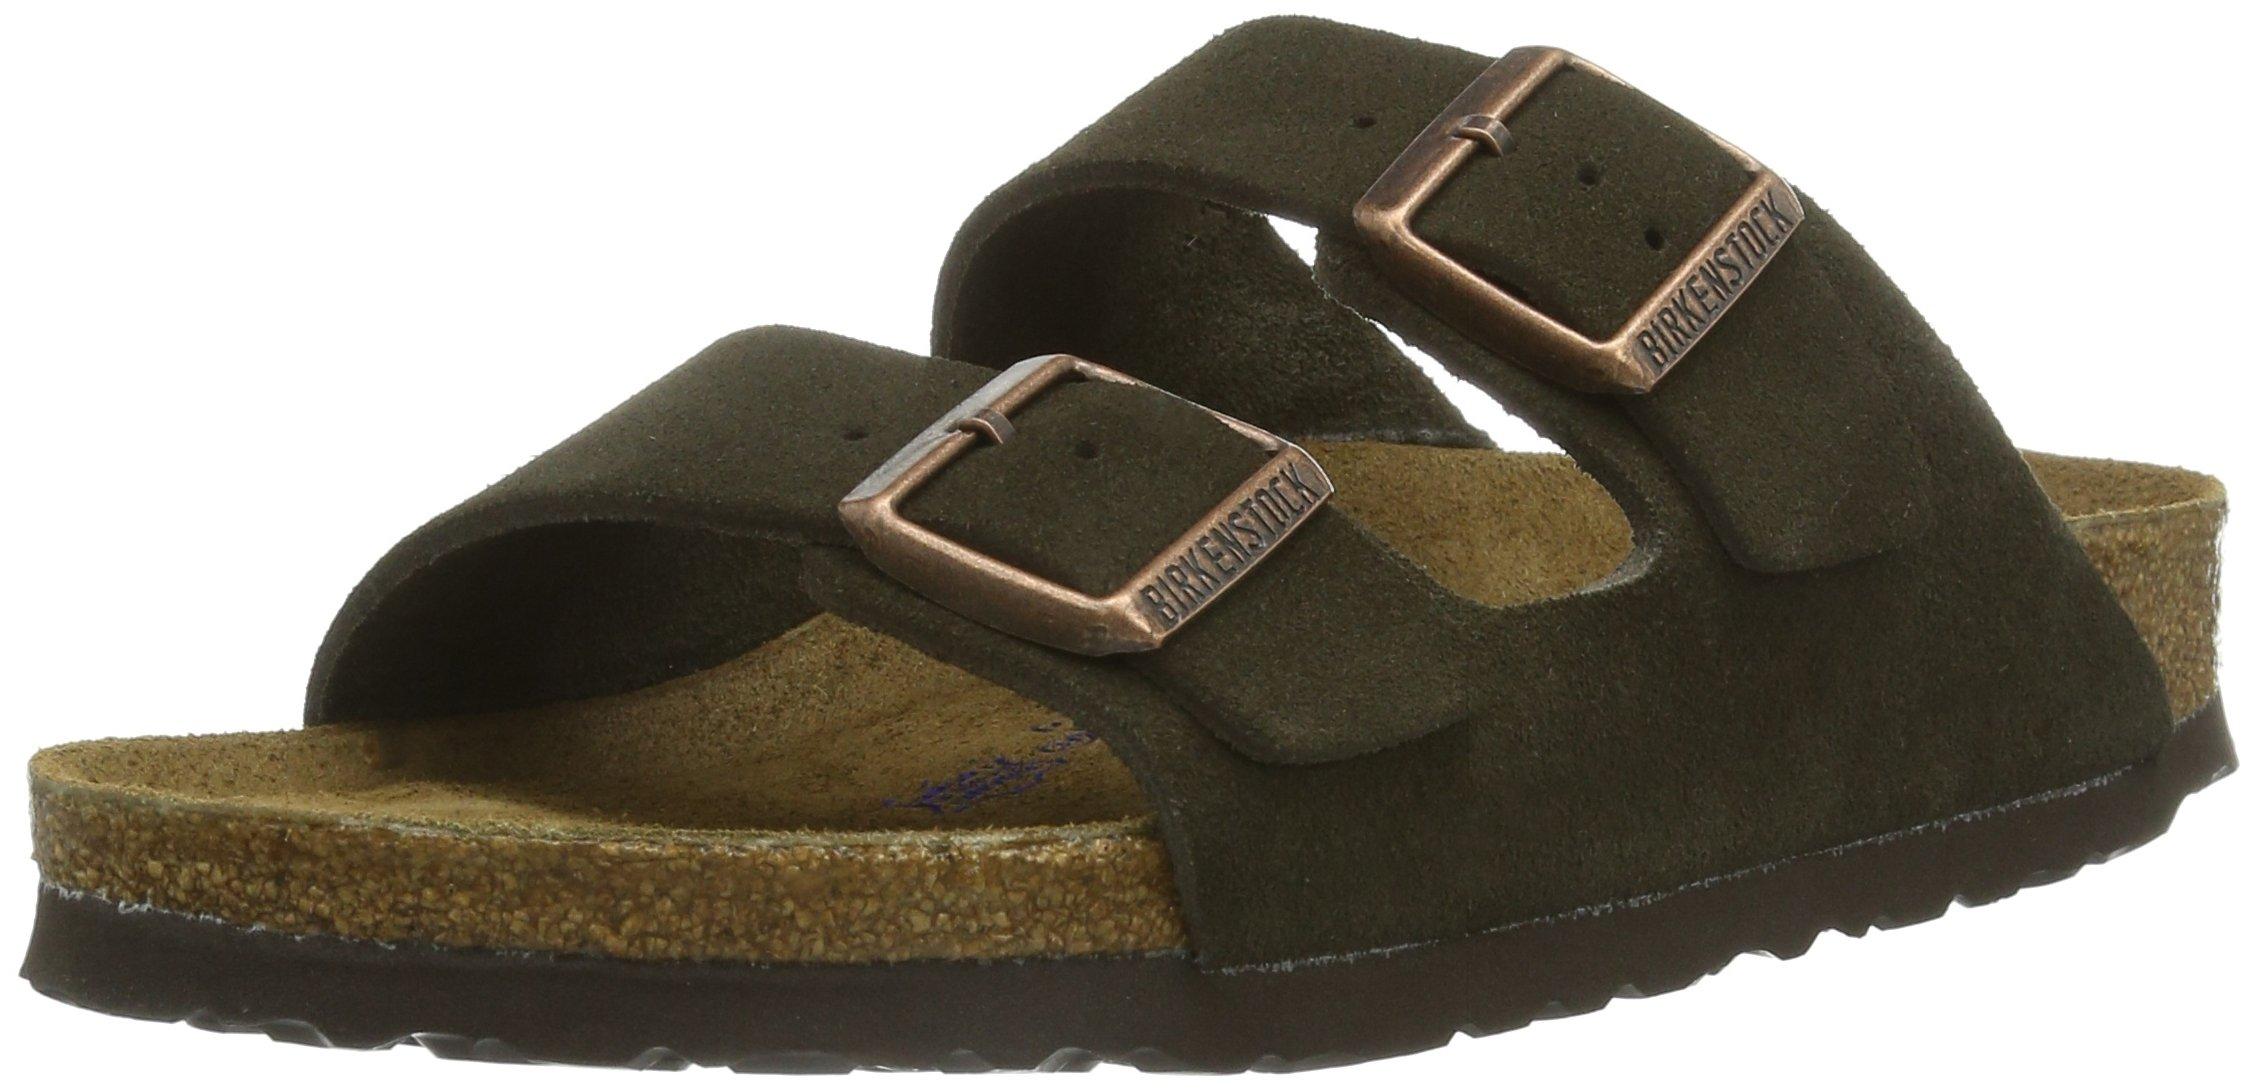 Birkenstock Women´s Arizona Mocha Suede Sandals 37 W EU R 951311